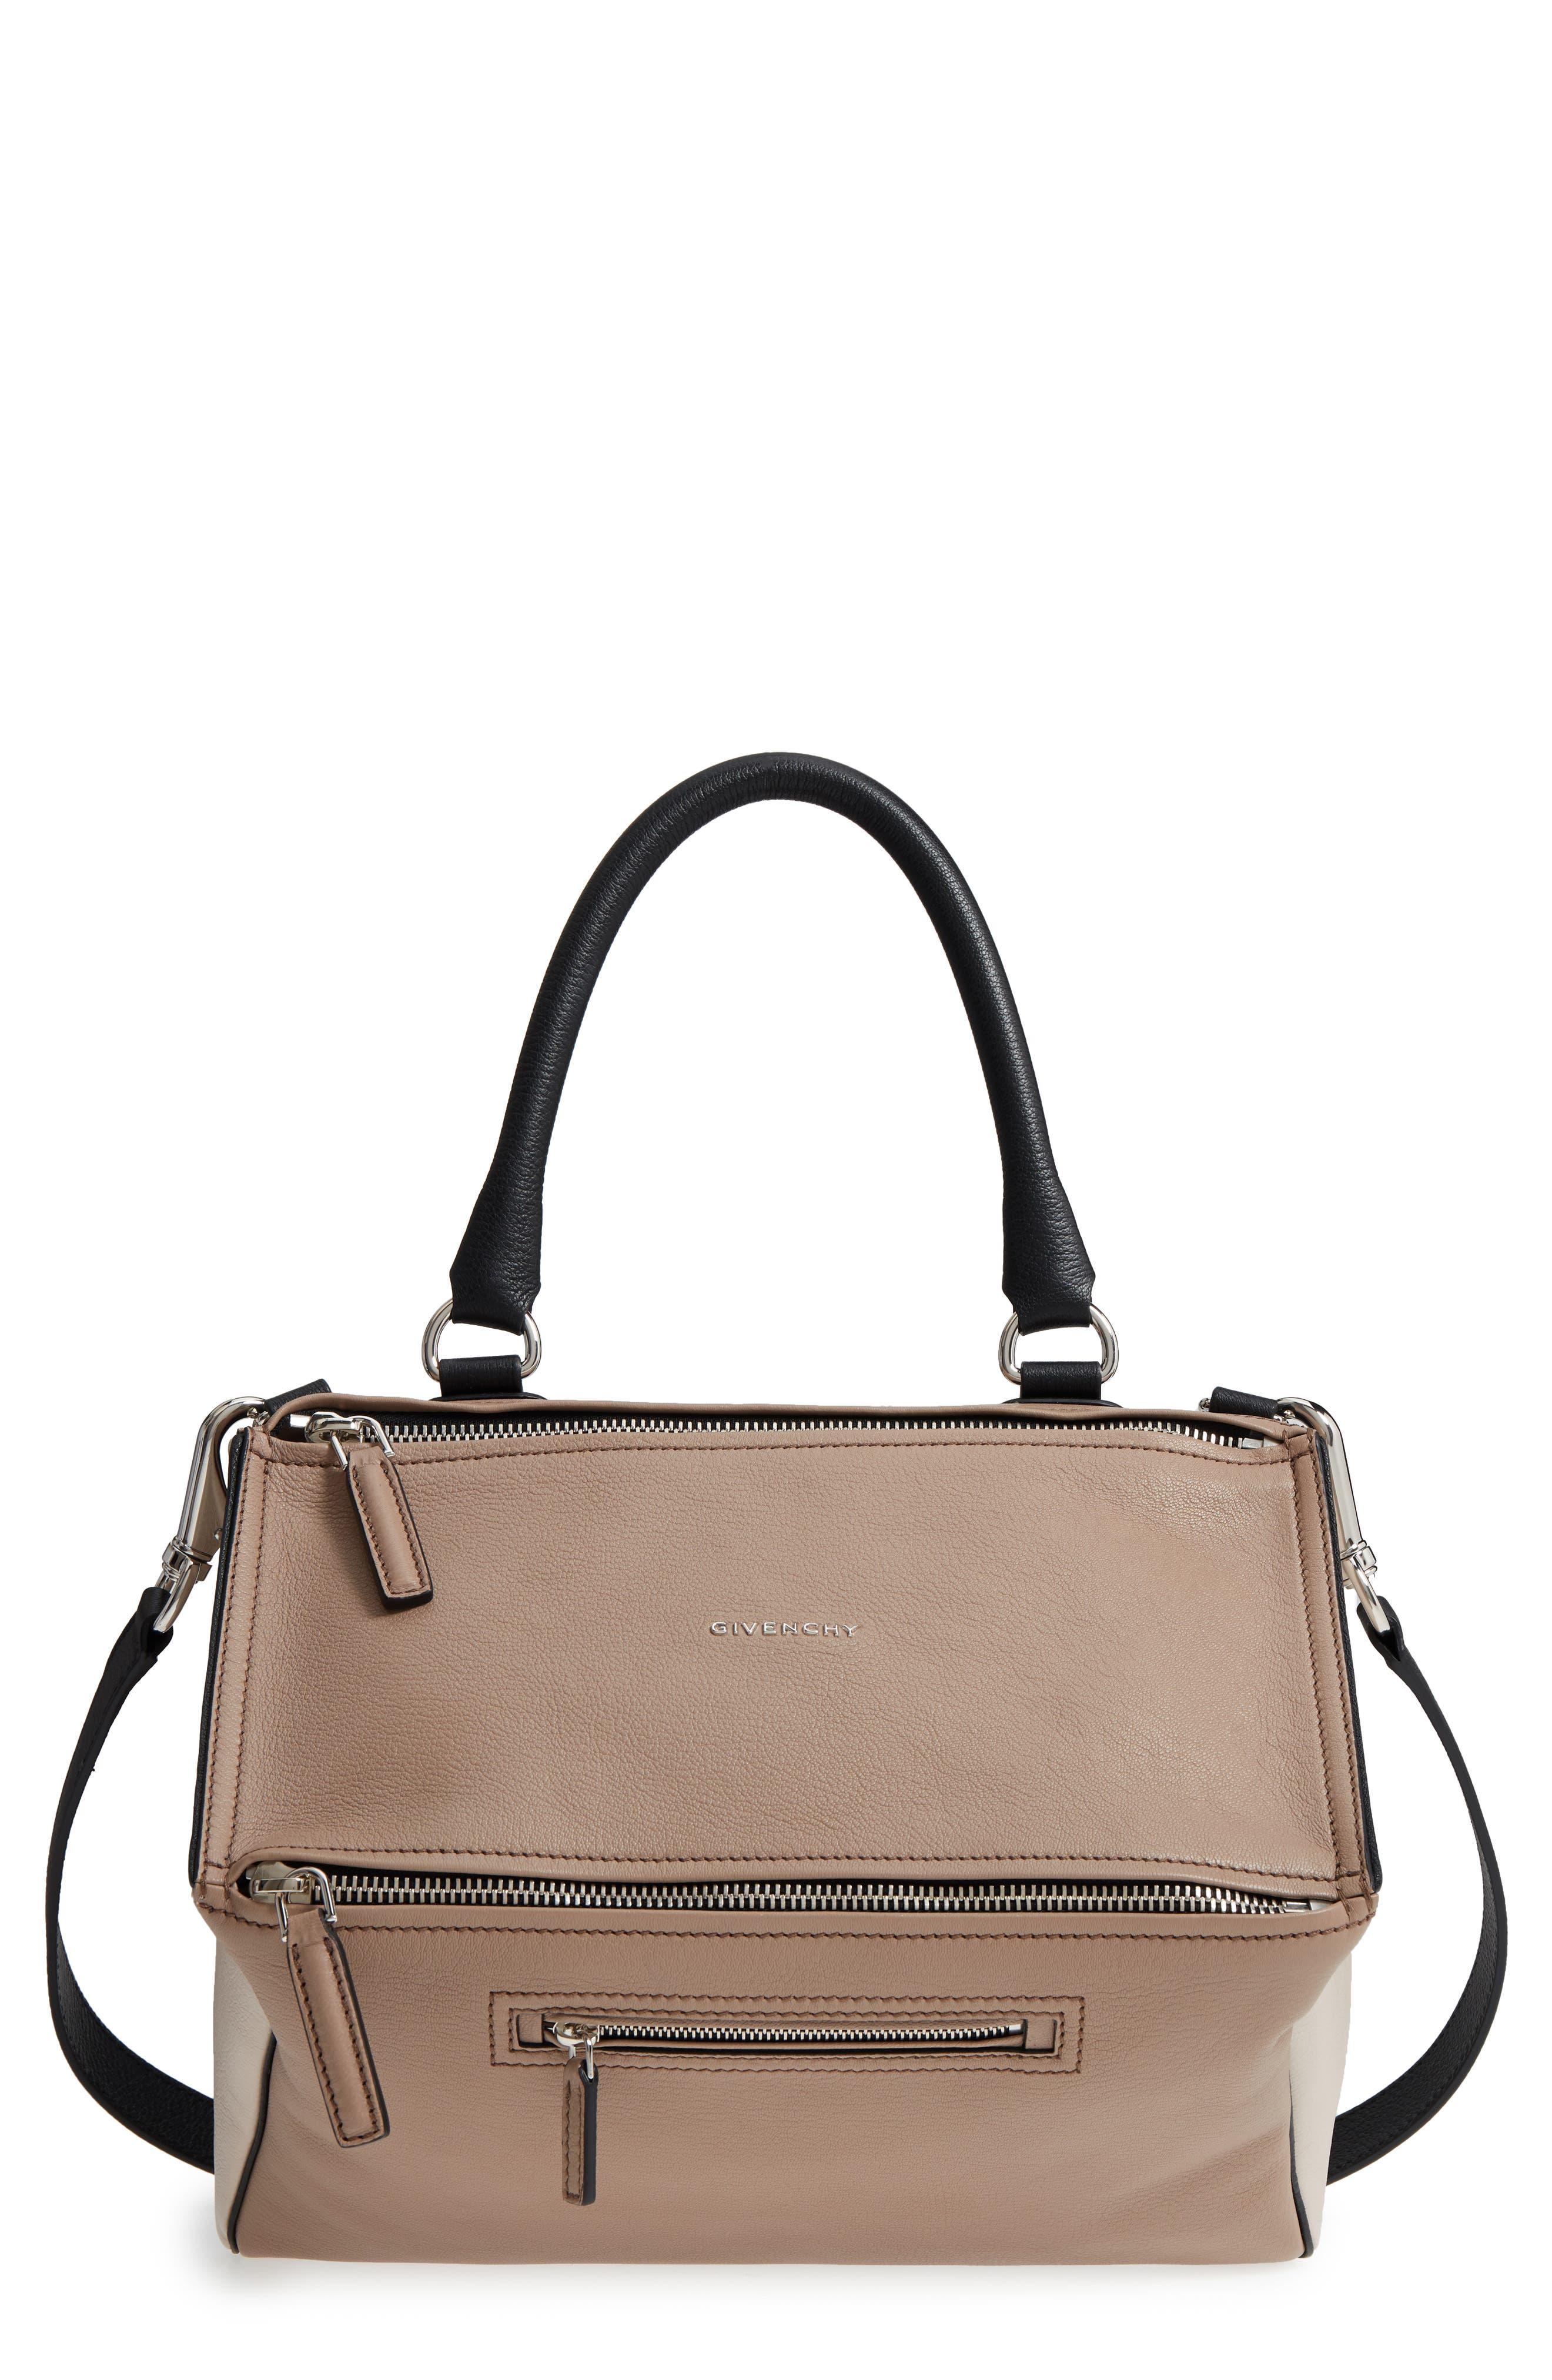 Medium Pandora Box Tricolor Leather Crossbody Bag,                         Main,                         color, Linen